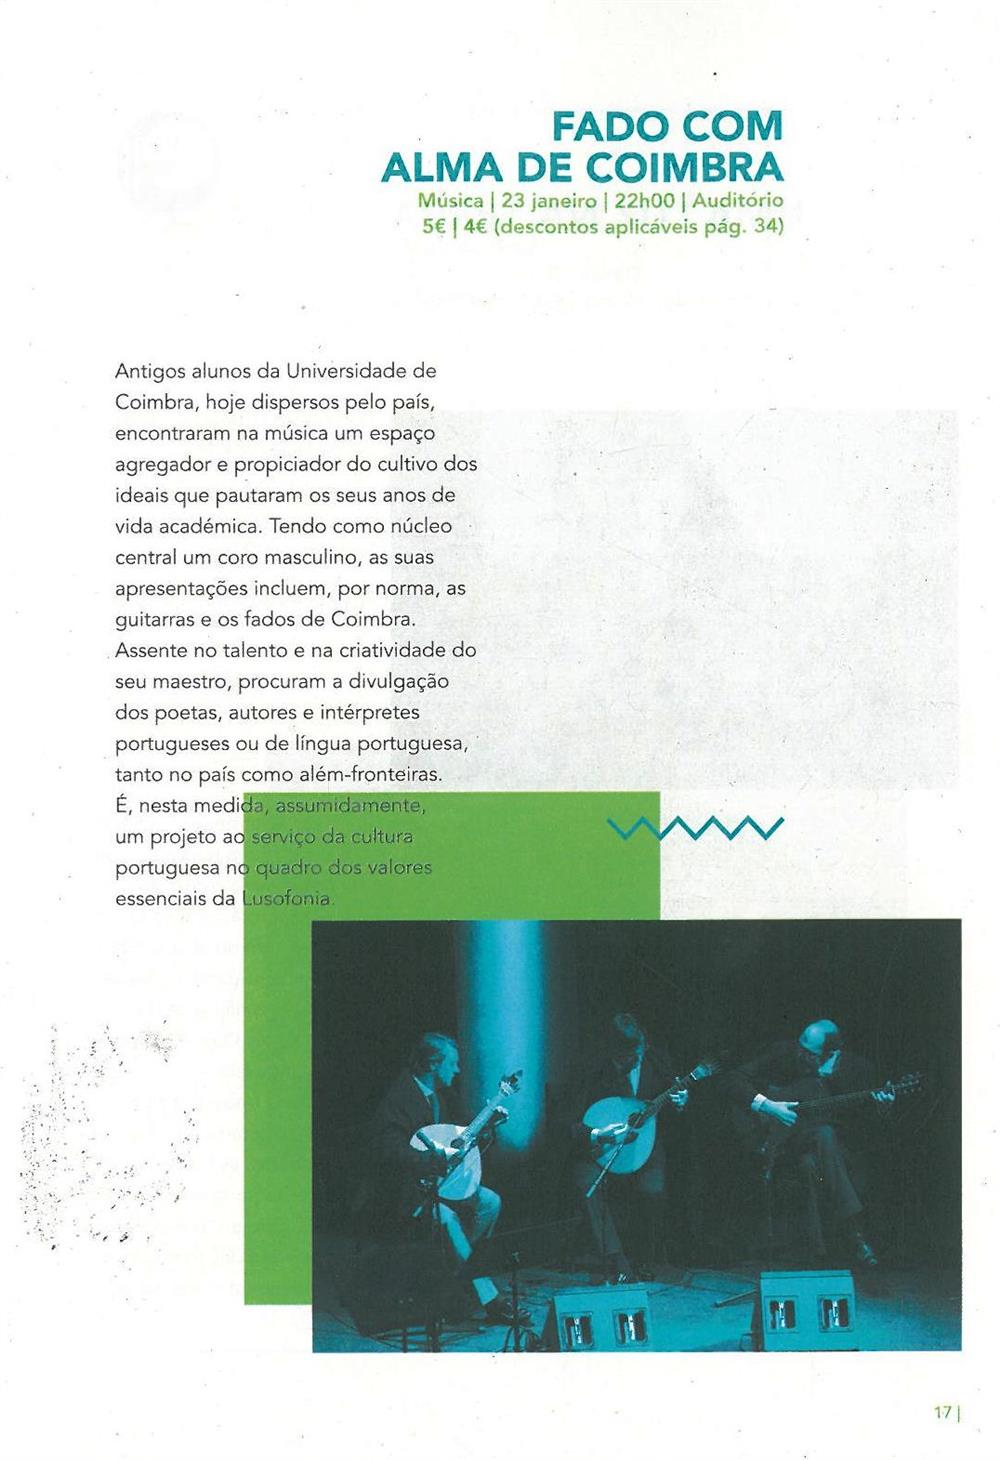 ACMSV-jan.,fev.,mar.'16-p.17-Fado com alma de Coimbra.jpg